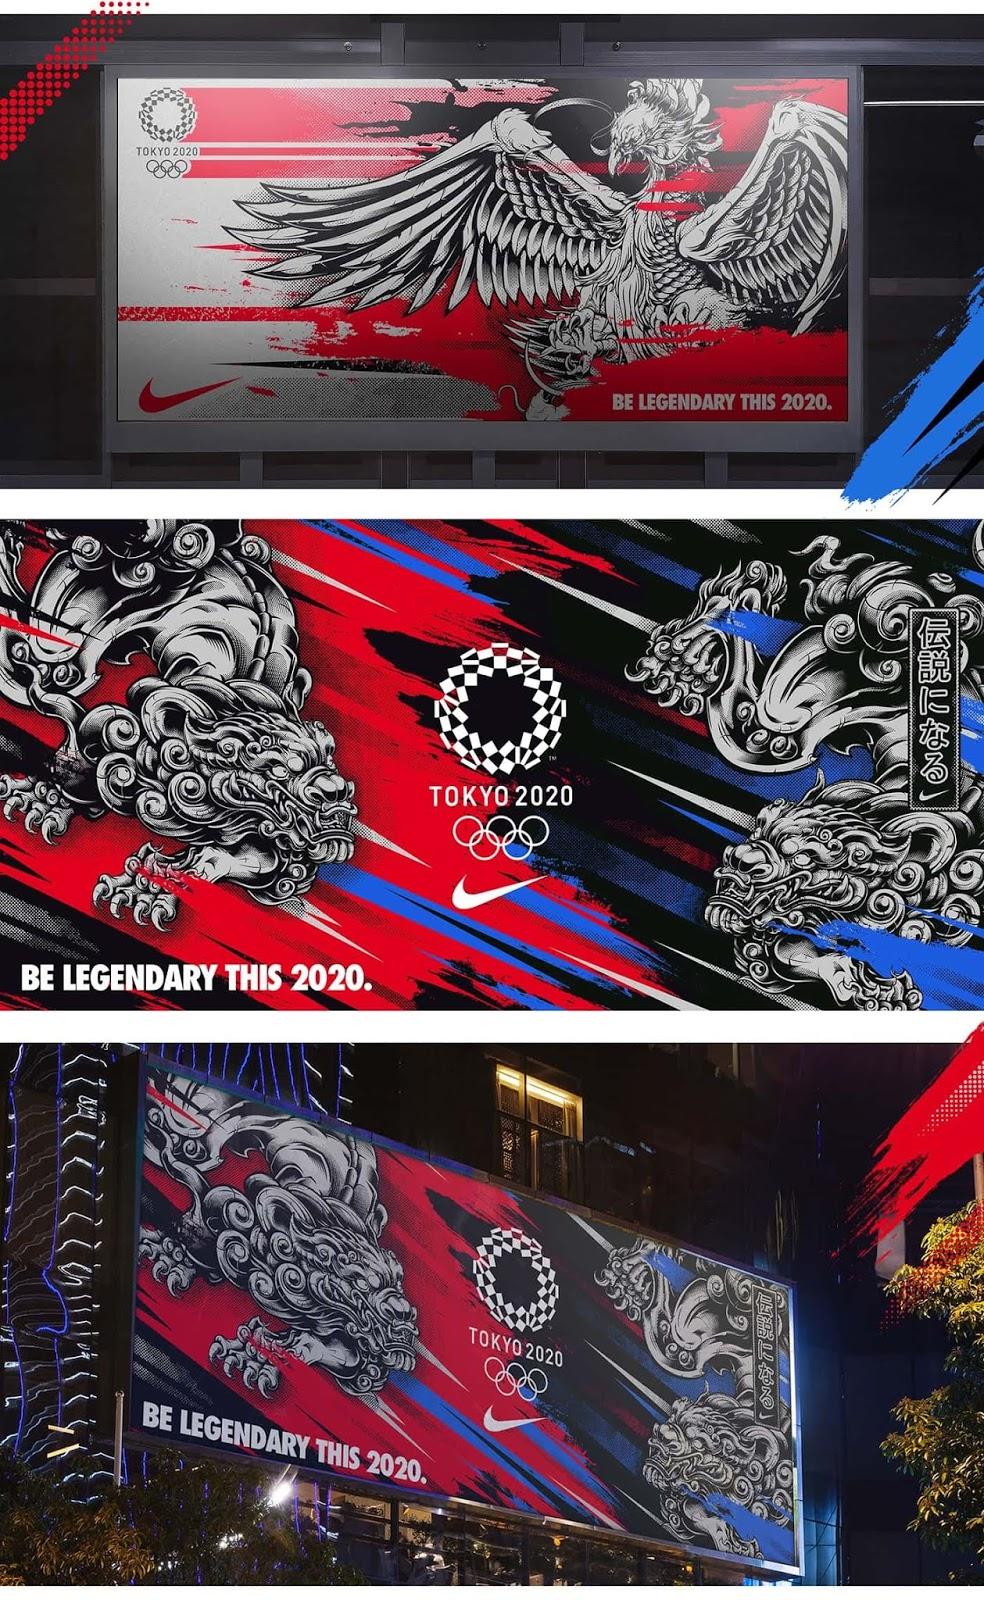 Be-Legendary-fuerte-concepto-de-branding-Nike-juegos-olimpicos-Tokyo-2020